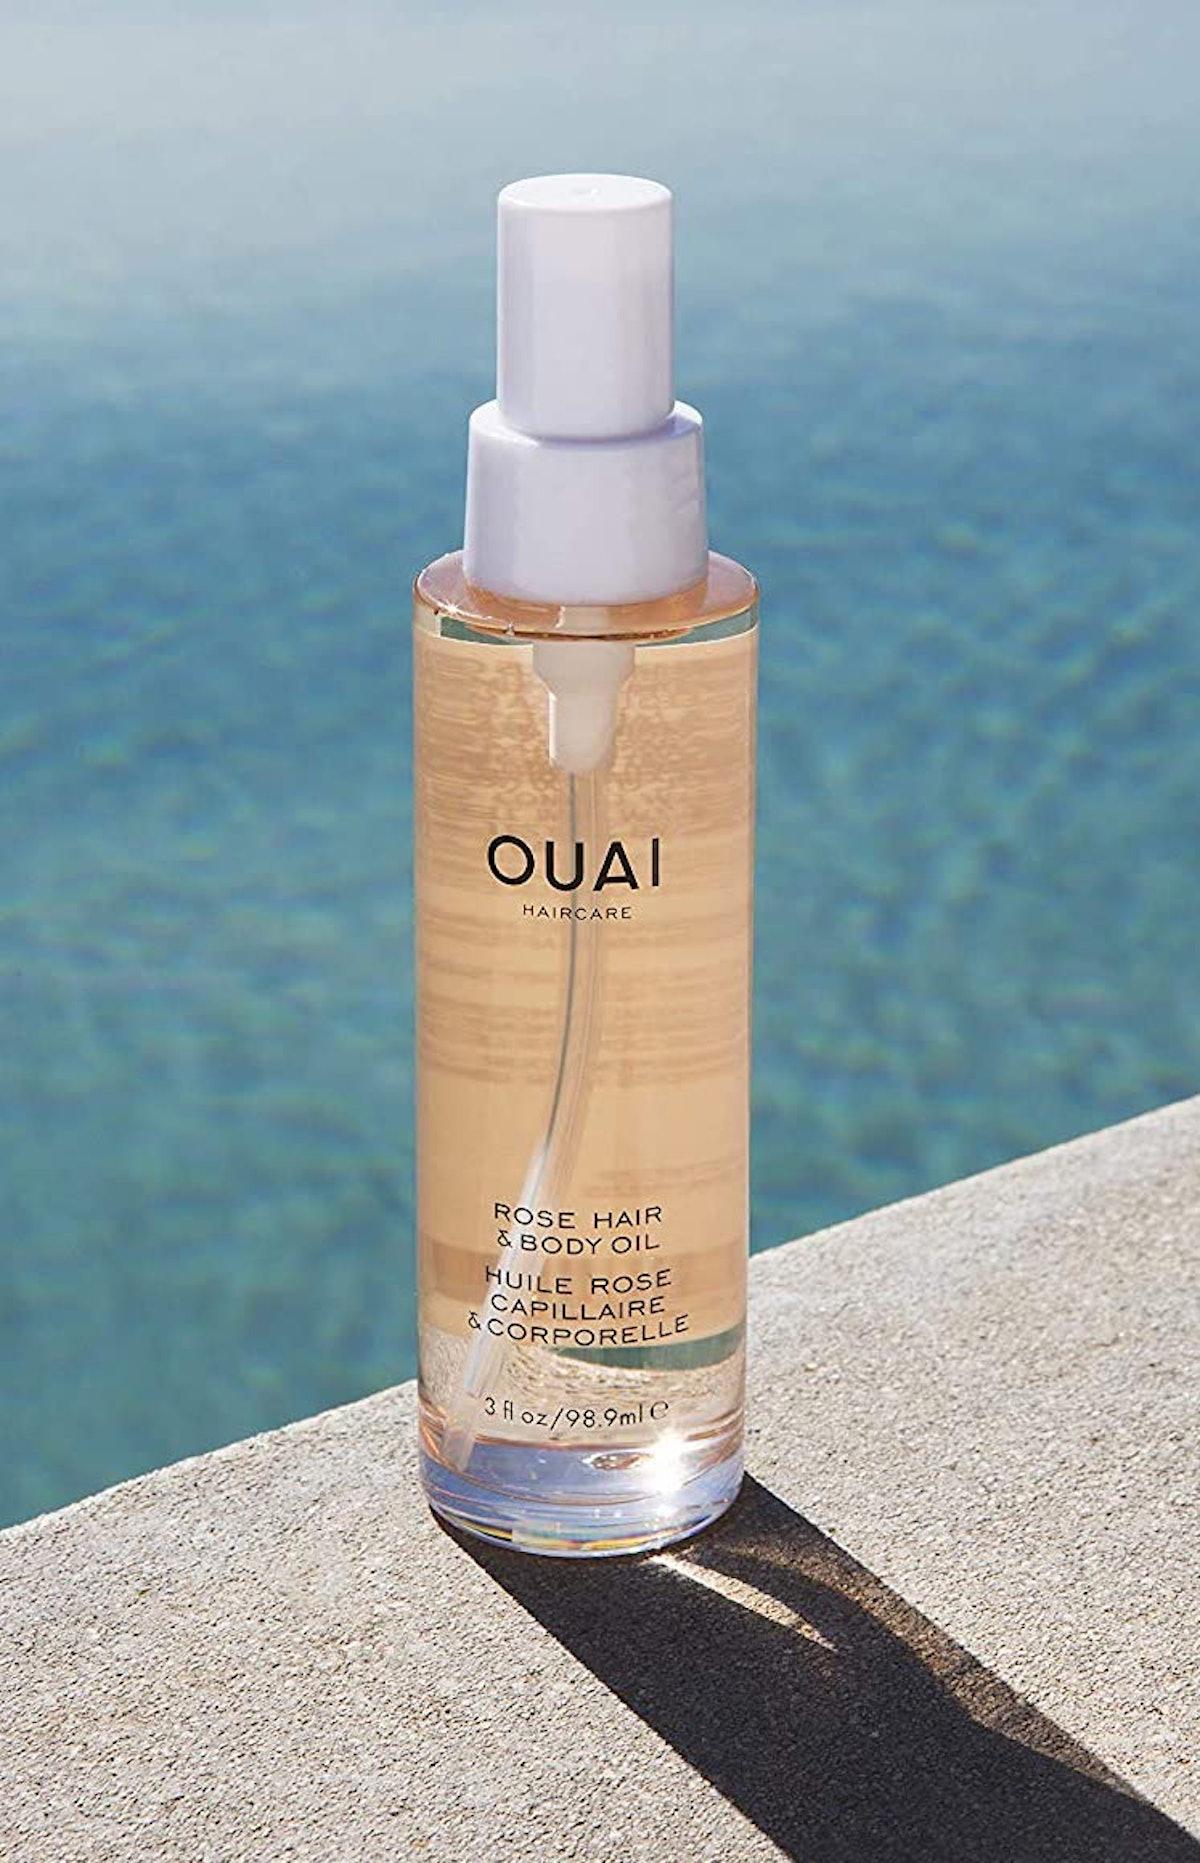 OUAI Fast Absorbing Luxurious Rose Hair & Body Oil